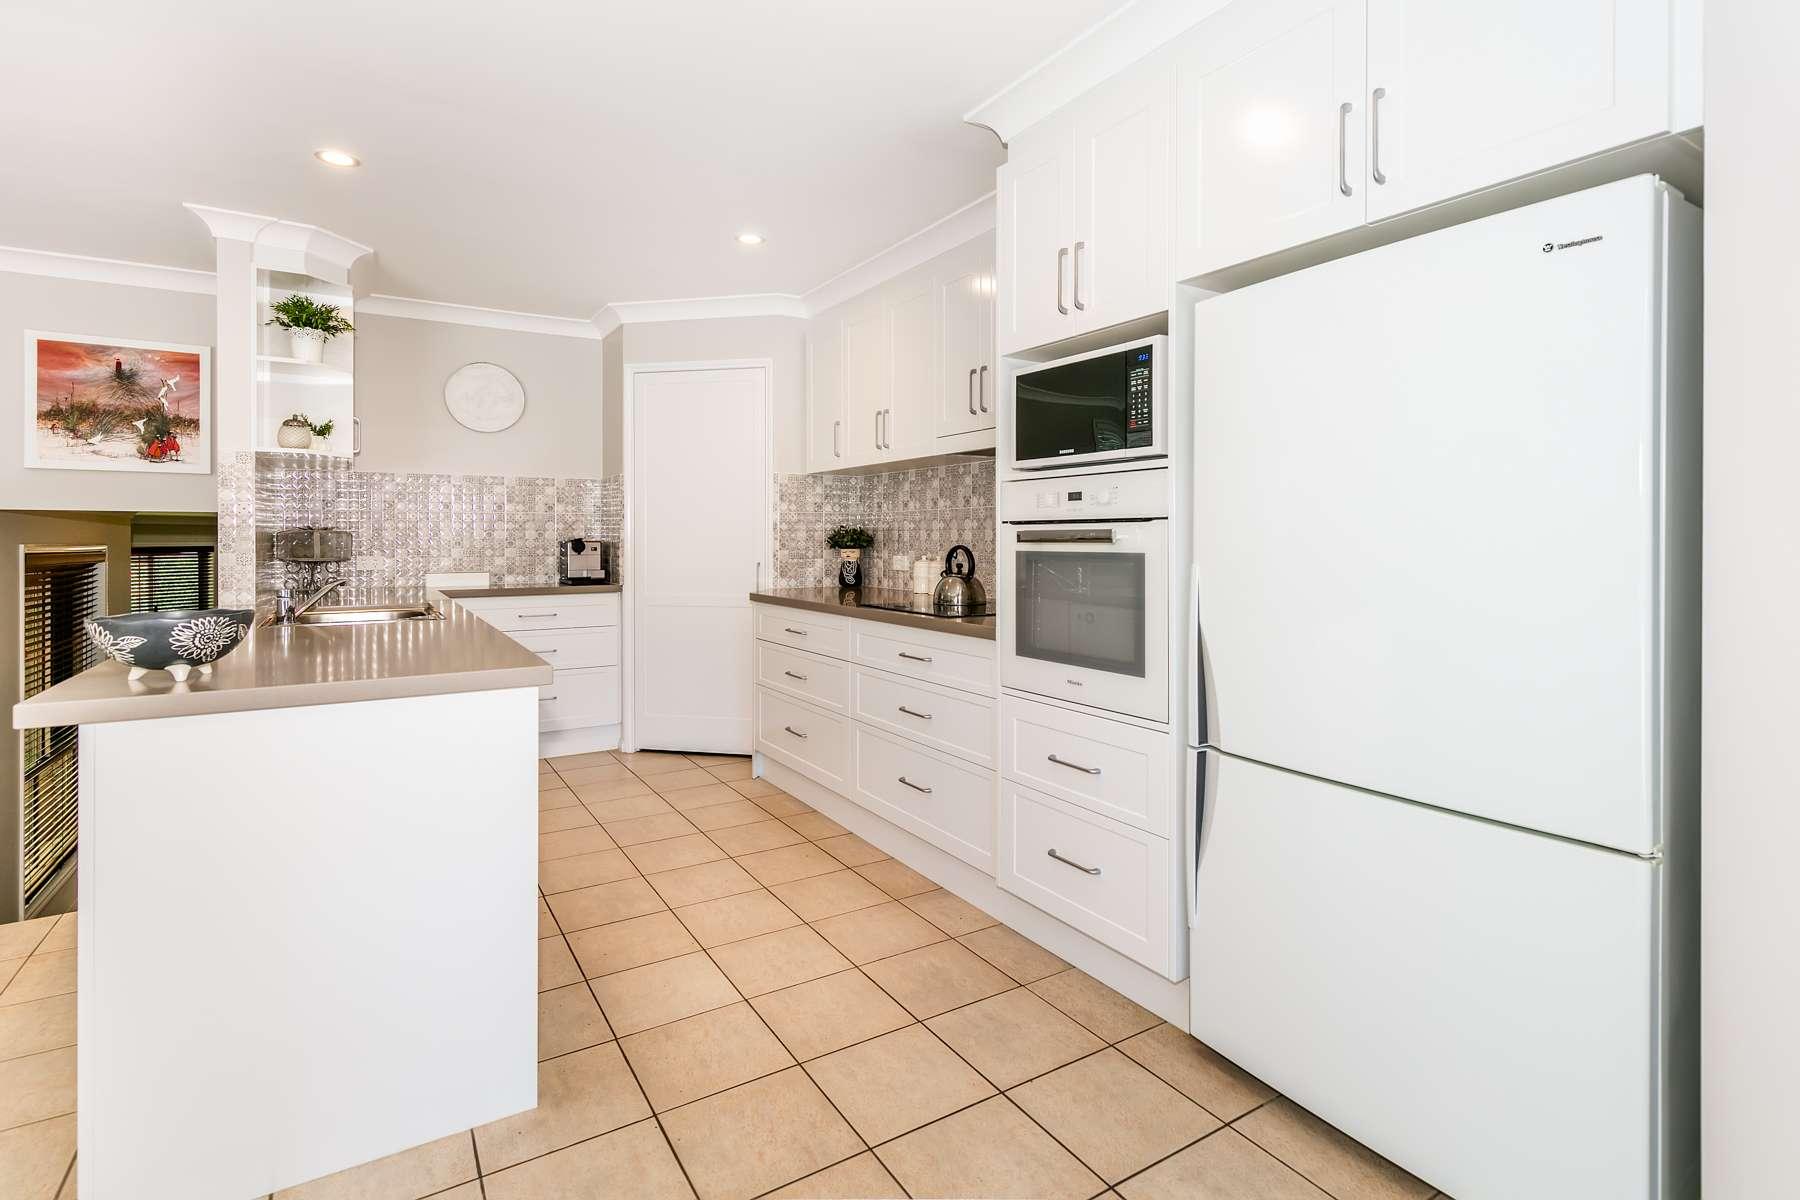 16 Farr-Jones Court, Daisy Hill, QLD 4127